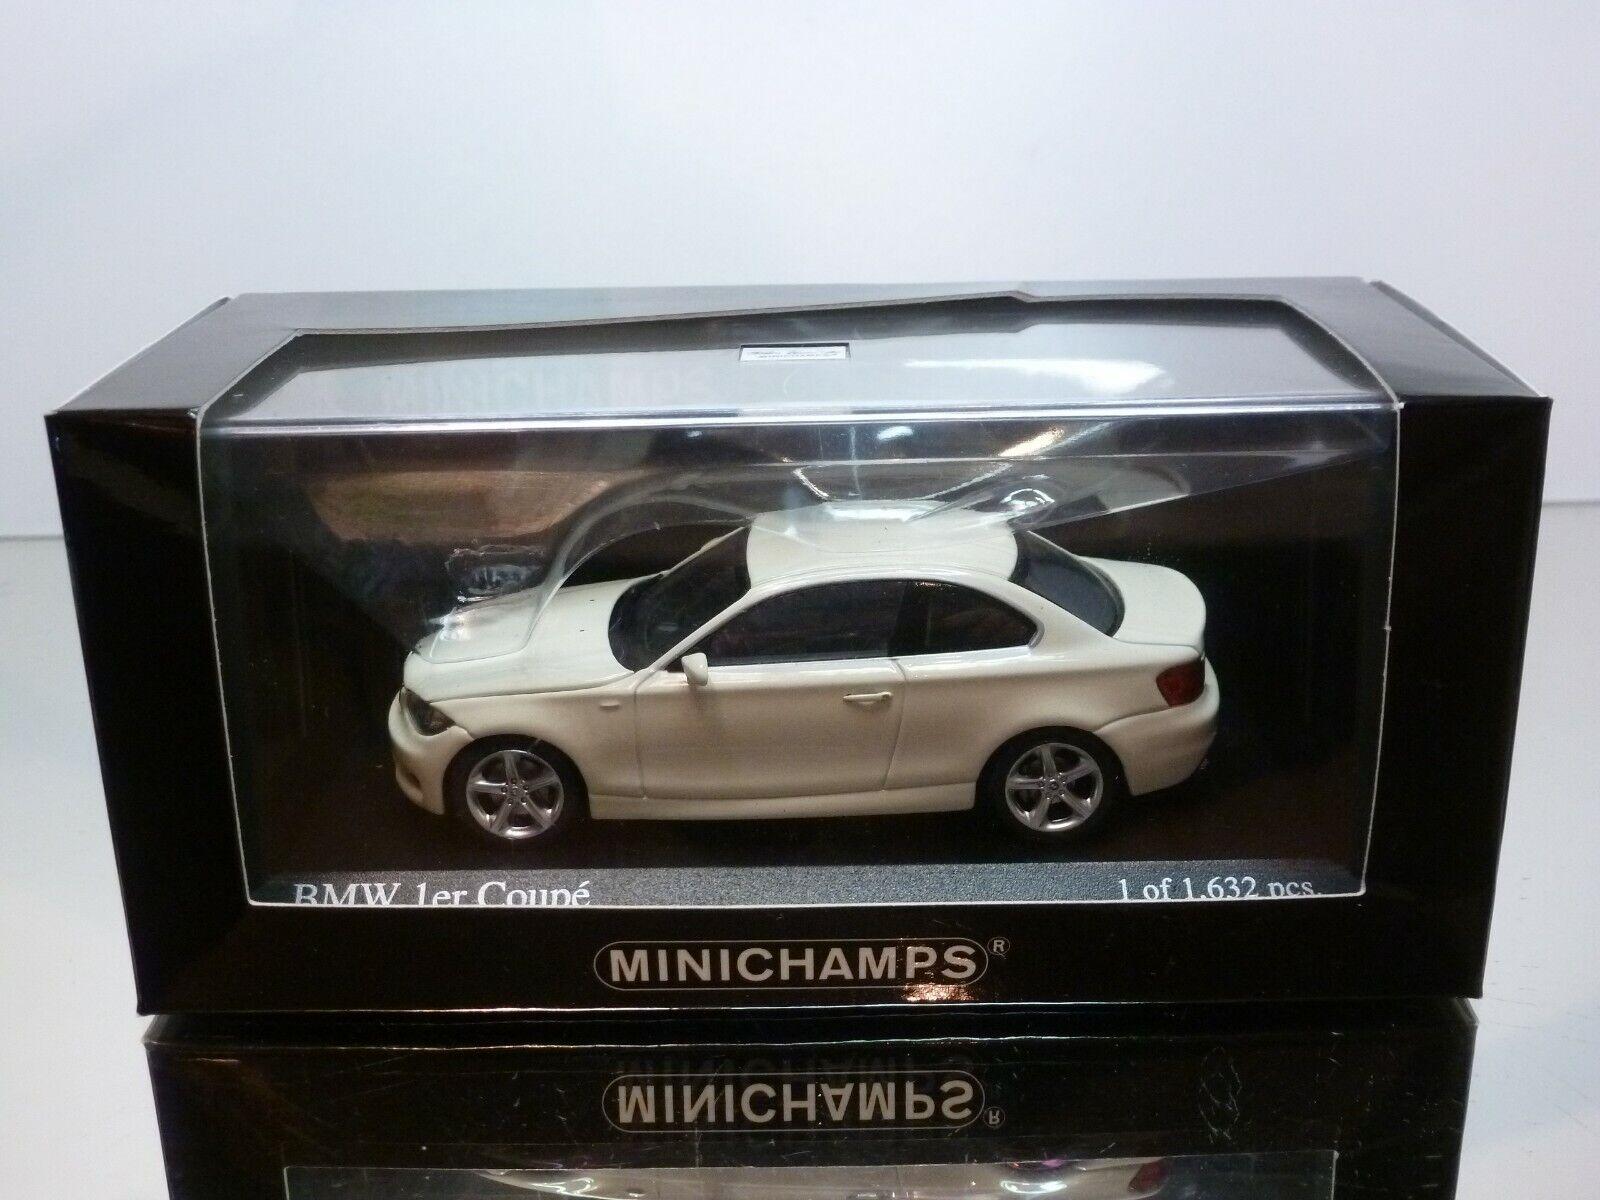 acquistare ora MINICHAMPS 26220 BMW 1 1 1 SERIES COUPE - 2007 - bianca 1 43 - EXCELLENT IN scatola  negozio outlet